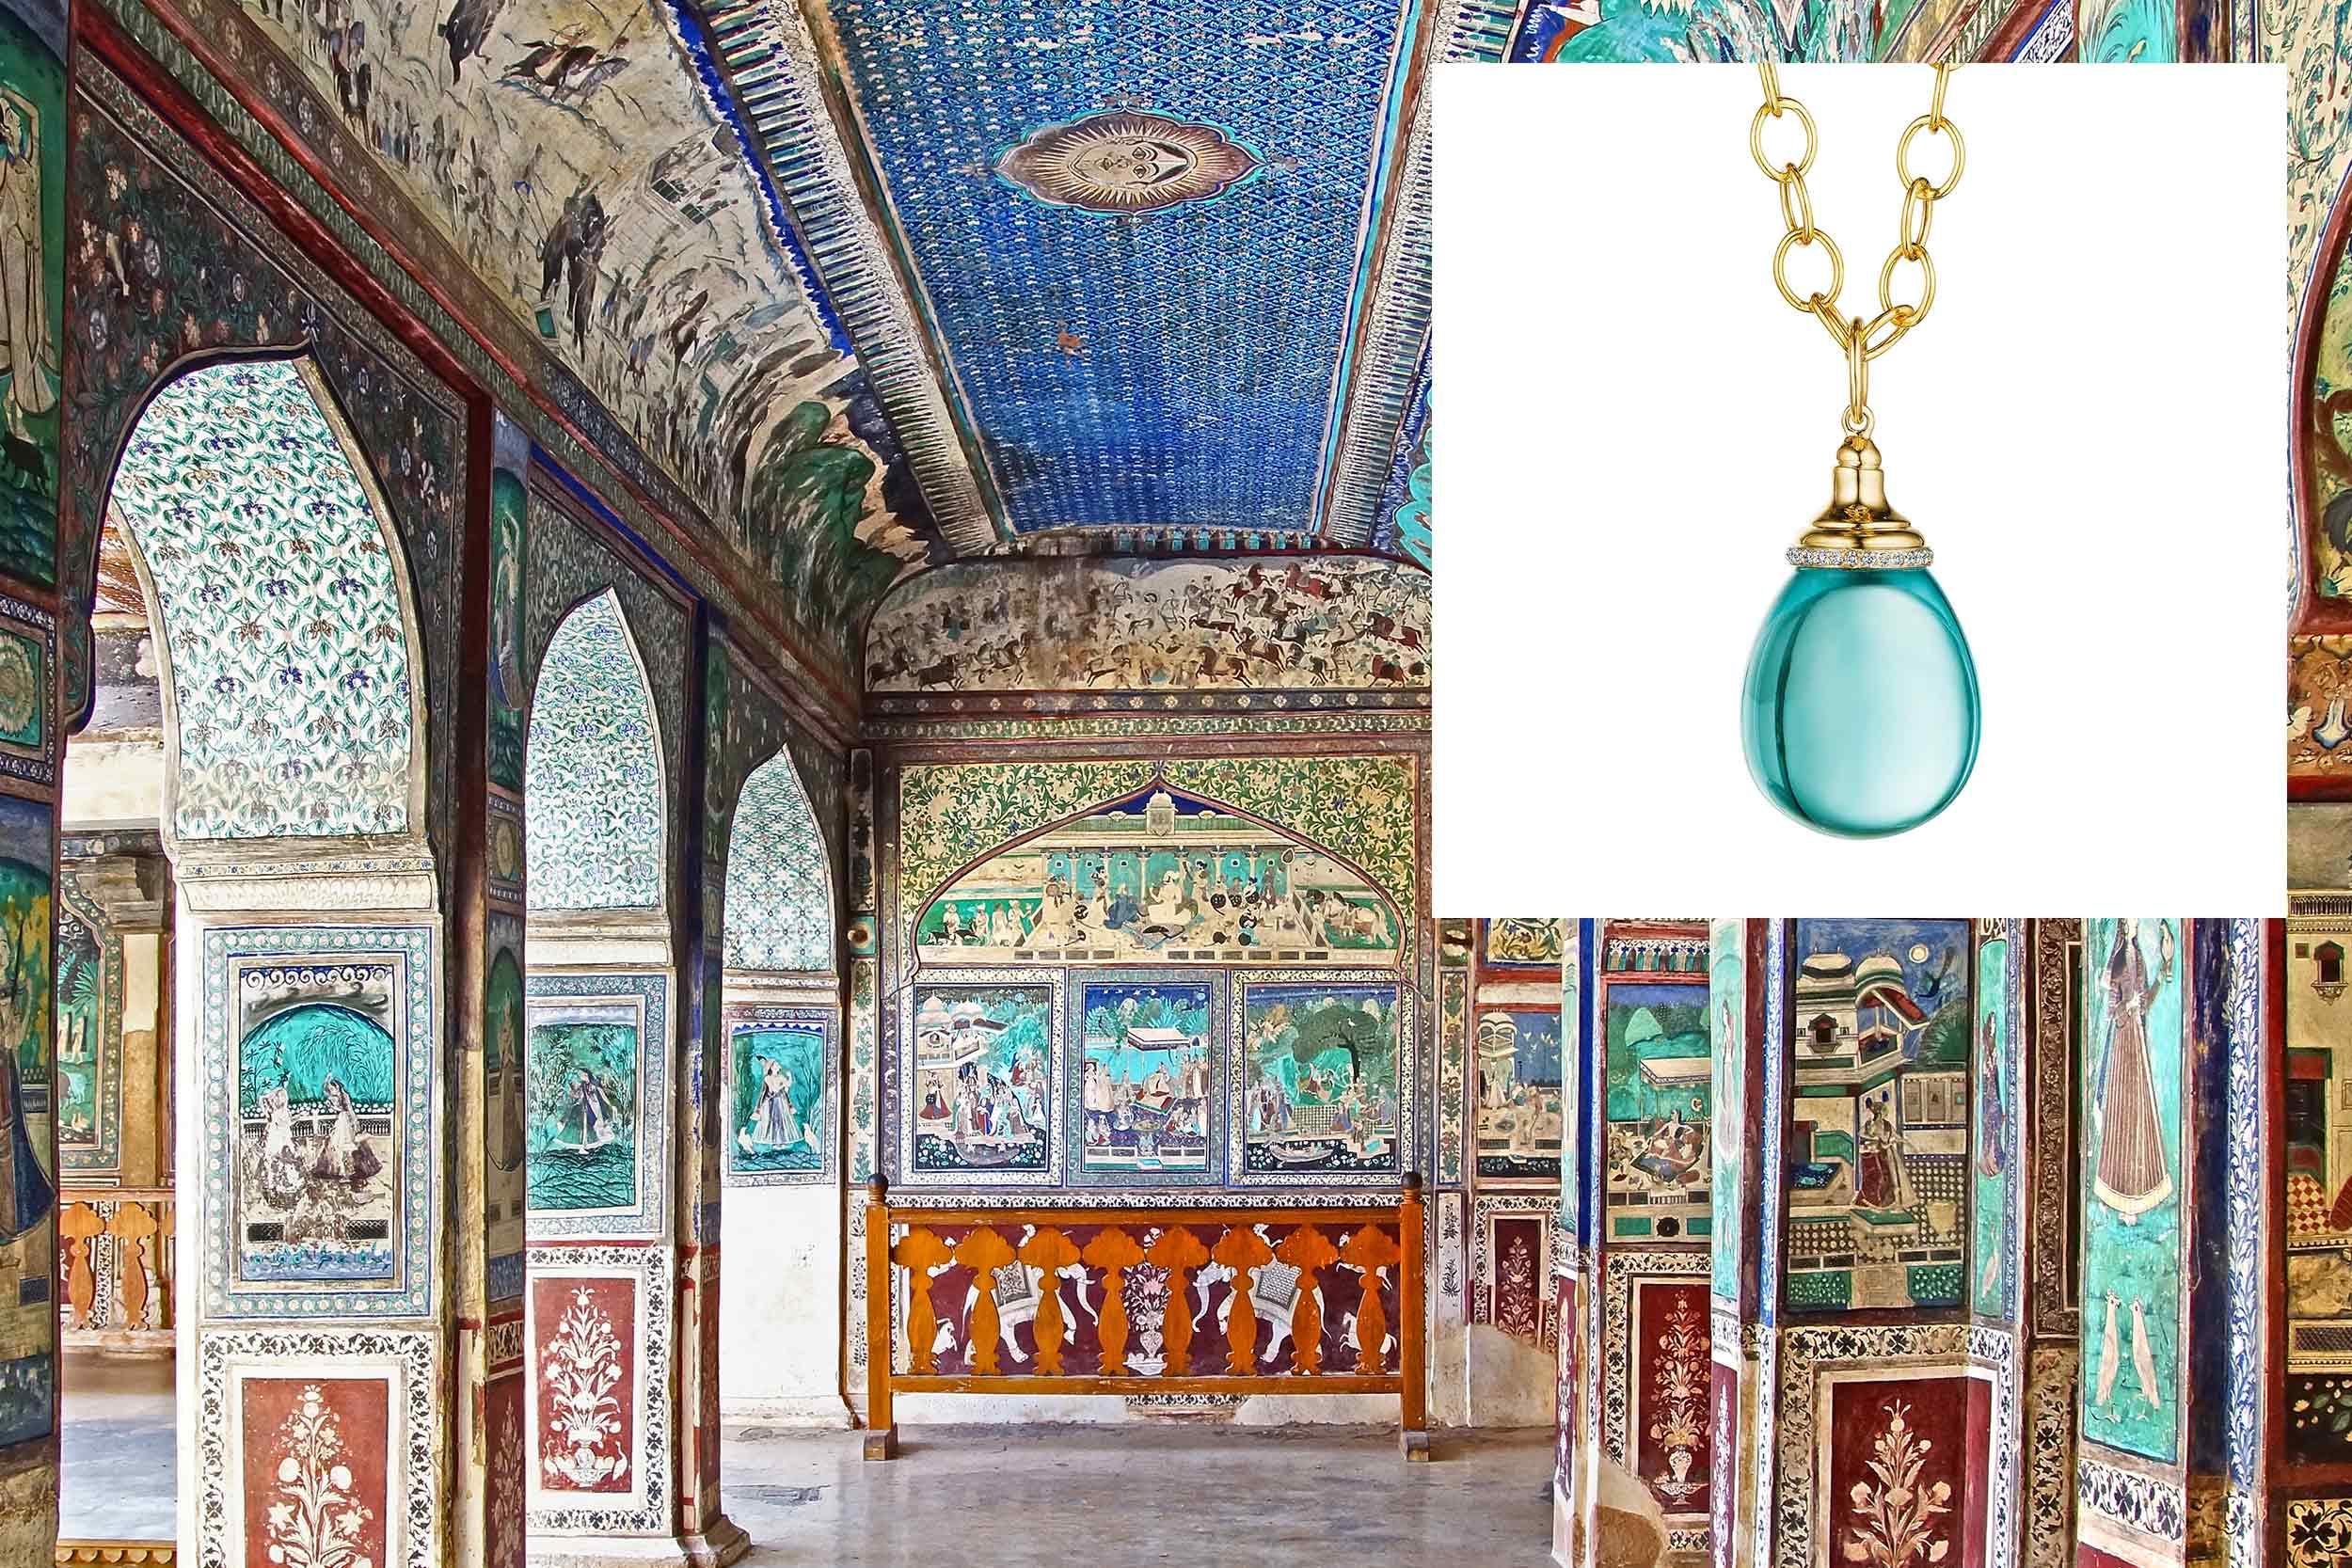 18kyg blue topaz mogul drop necklace with diamonds